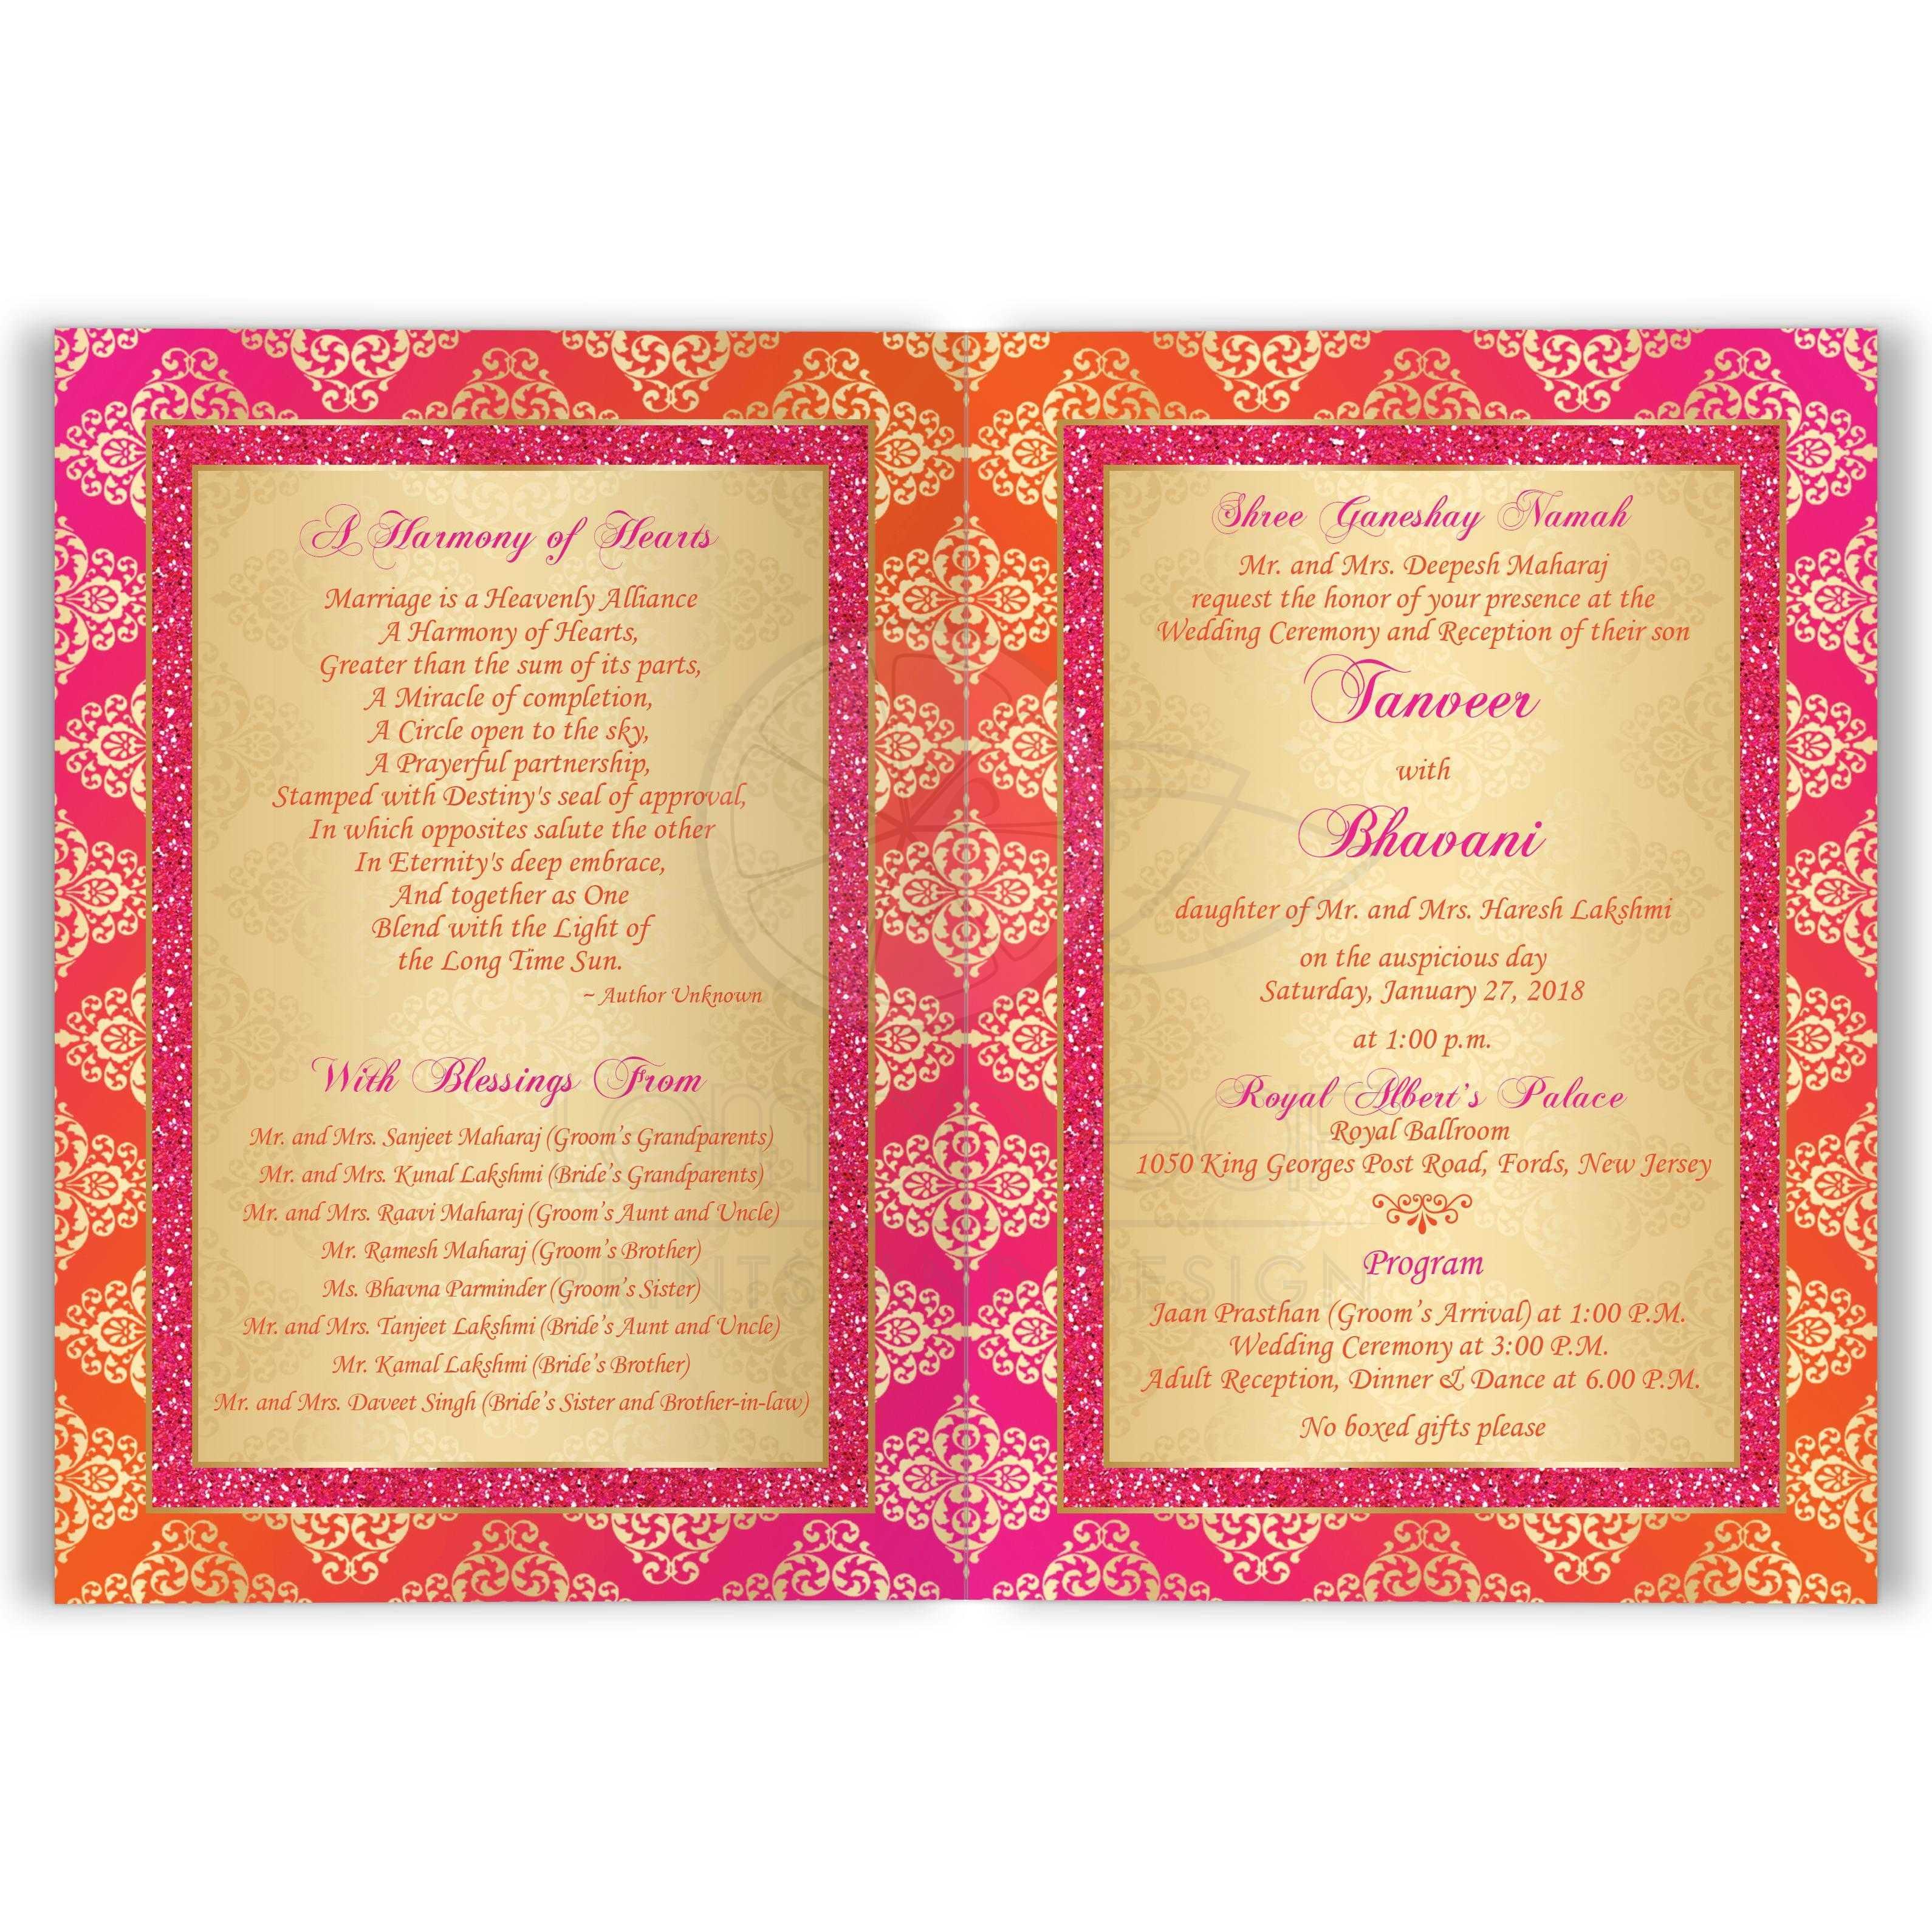 indian wedding invitation card orange, fuchsia, gold damask Affordable Hindu Wedding Cards affordable indian or hindu wedding card invitation in fuchsia pink, orange and gold damask affordable hindu wedding cards